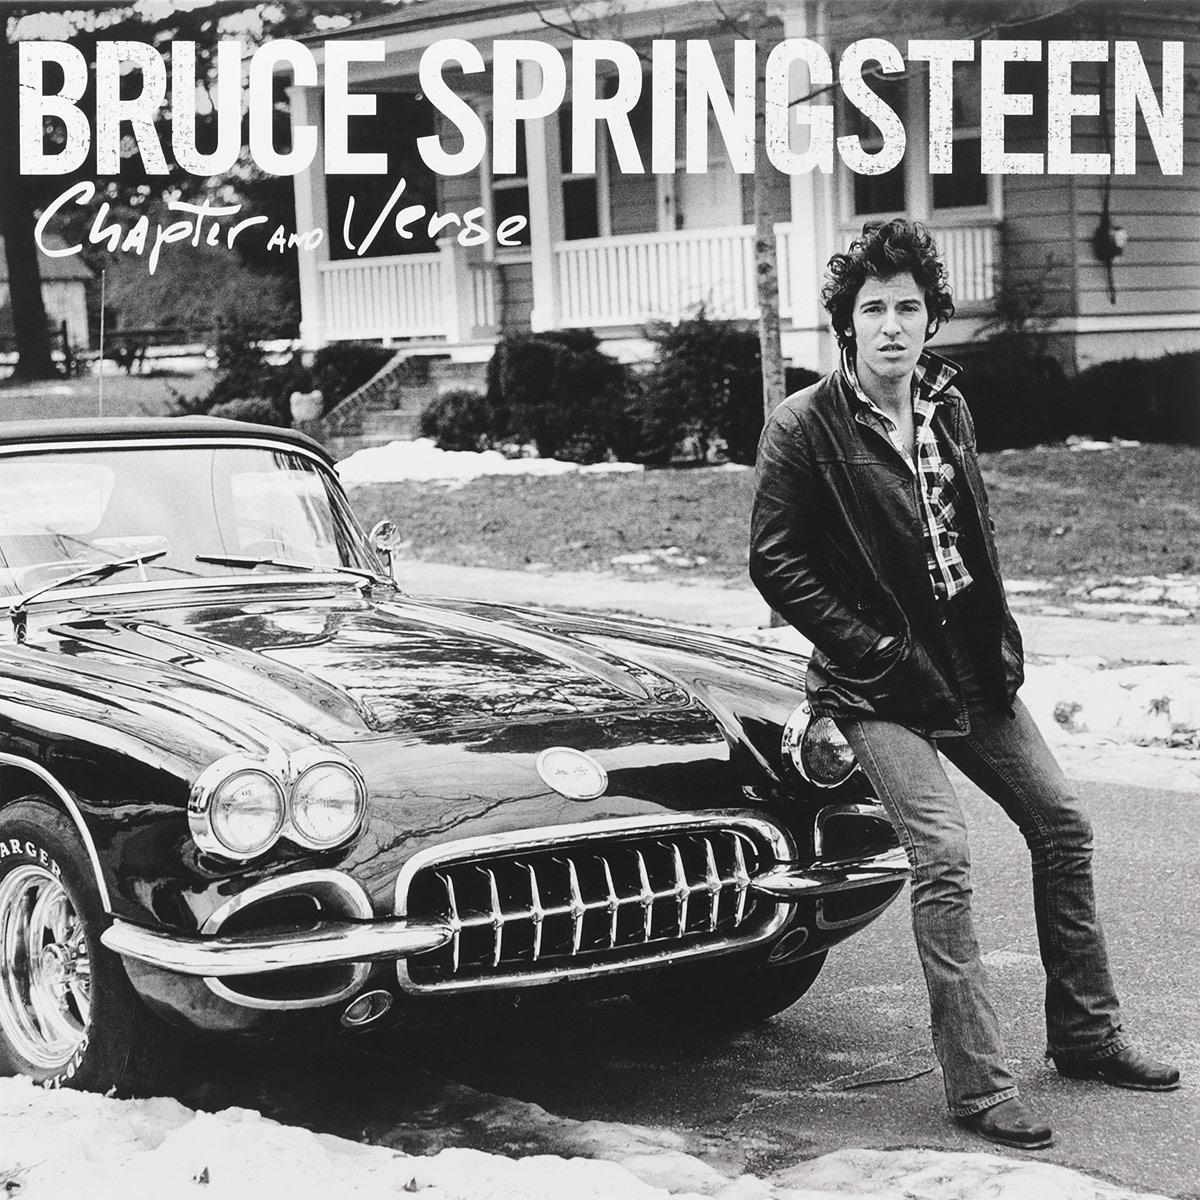 Брюс Спрингстин Bruce Springsteen. Chapter And Verse (2 LP) брюс спрингстин bruce springsteen the human rights broadcast argentina 1988 2 lp